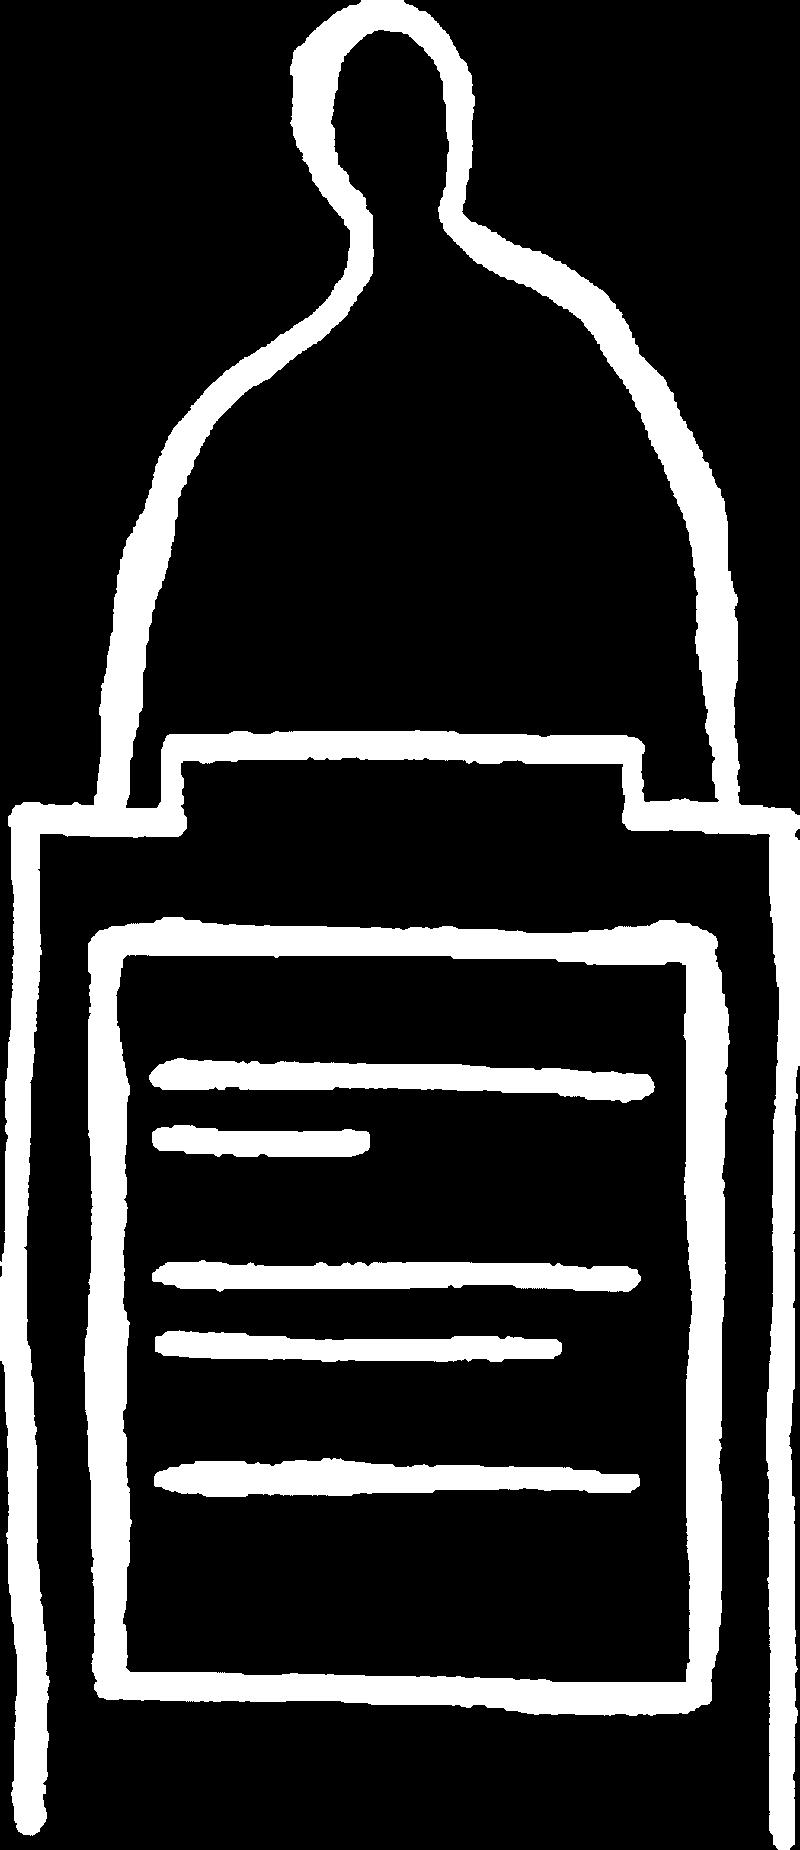 Teamontwikkeling Praktijkgids (2020)